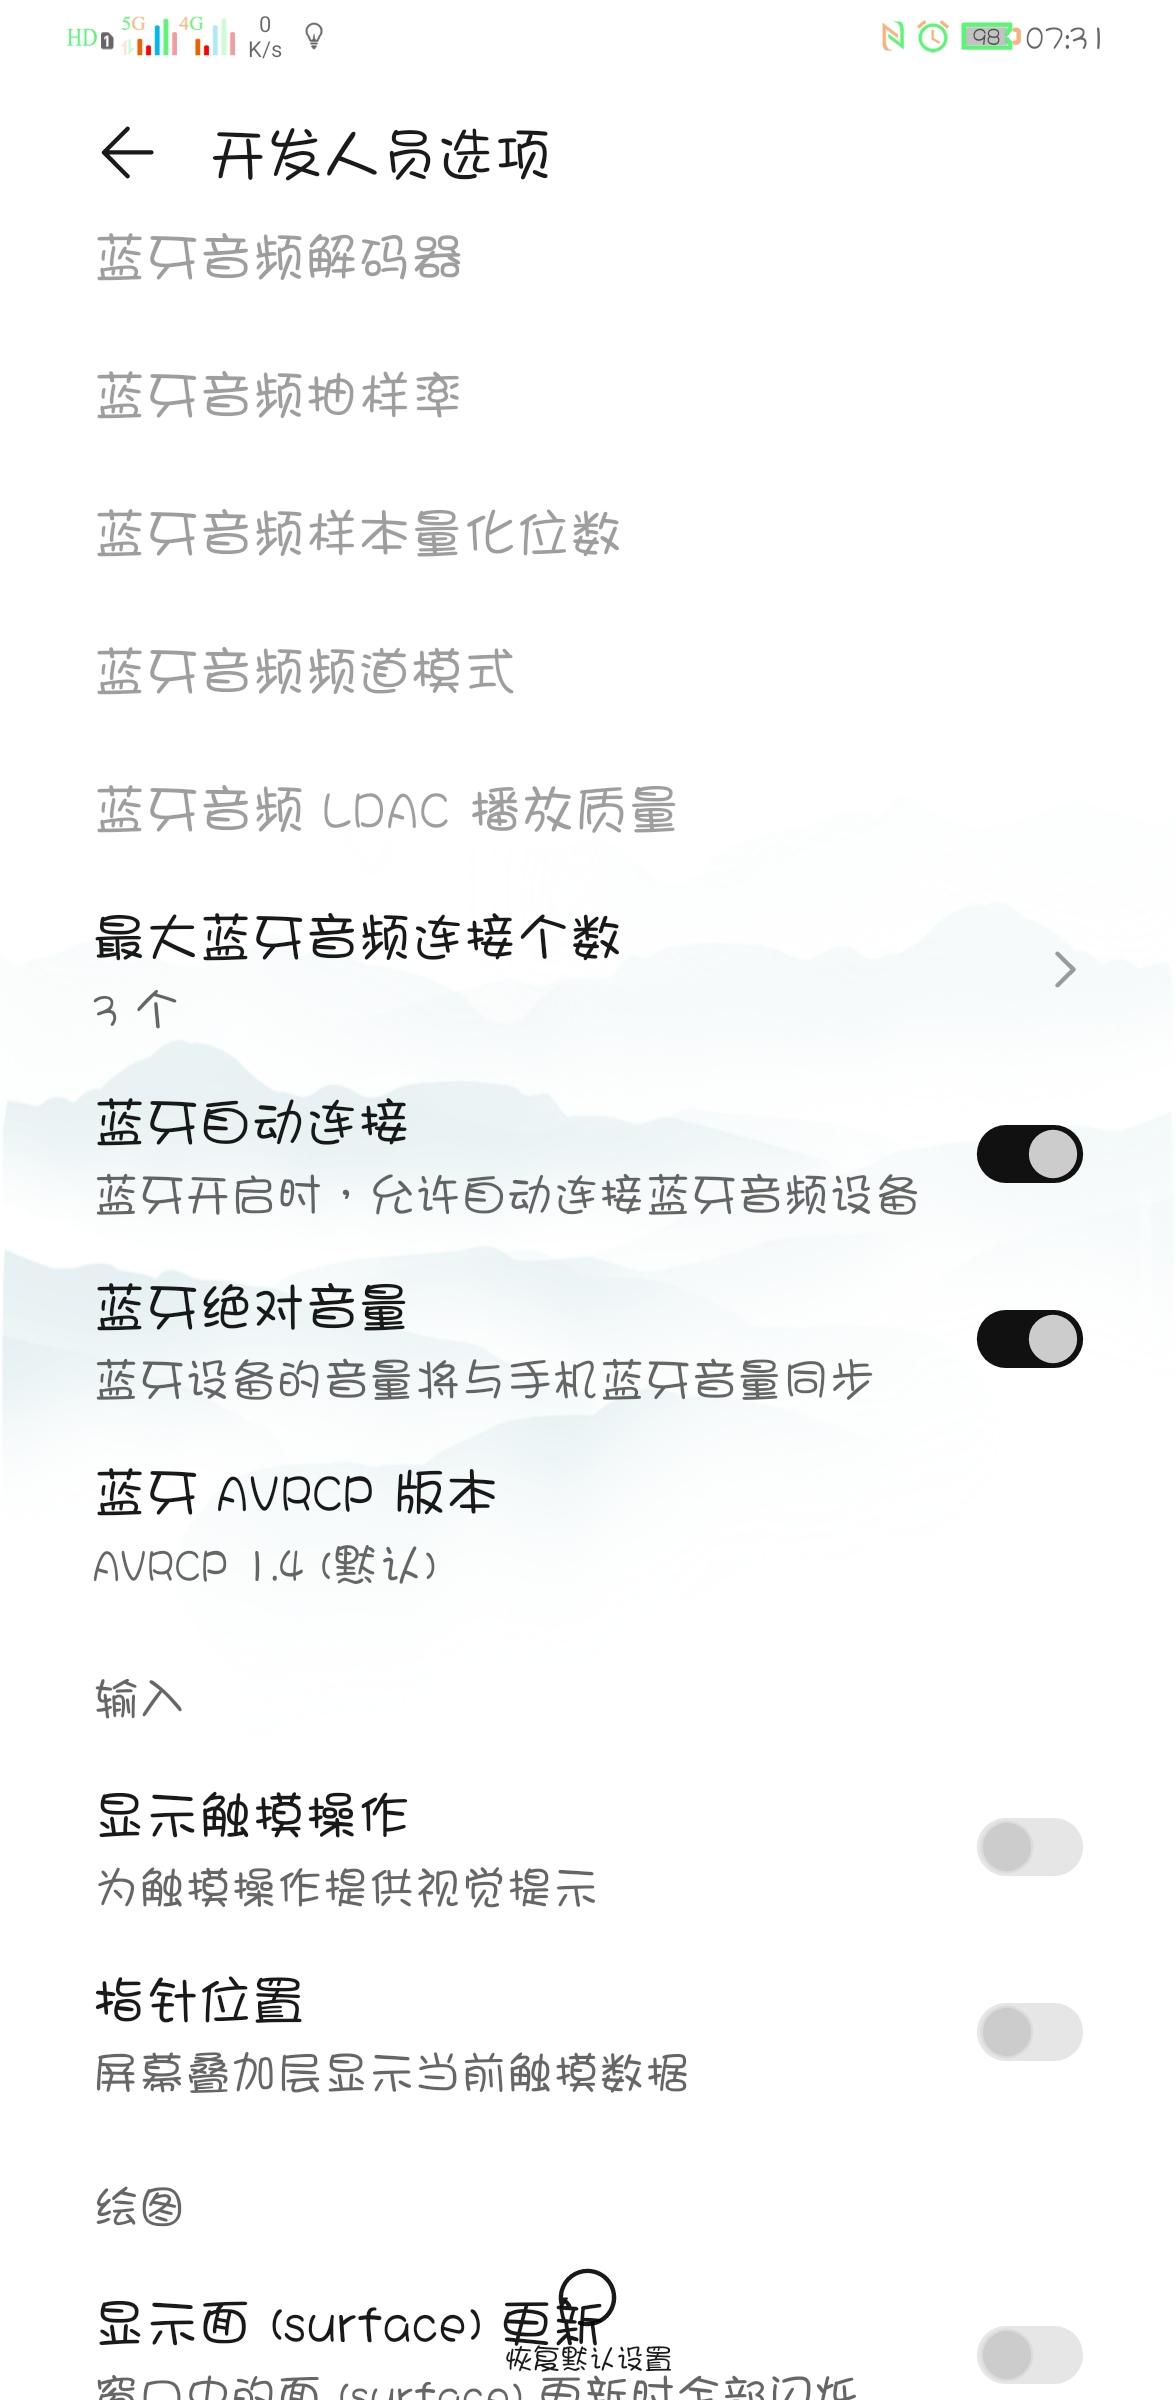 Screenshot_20200516_073159_com.android.settings.jpg